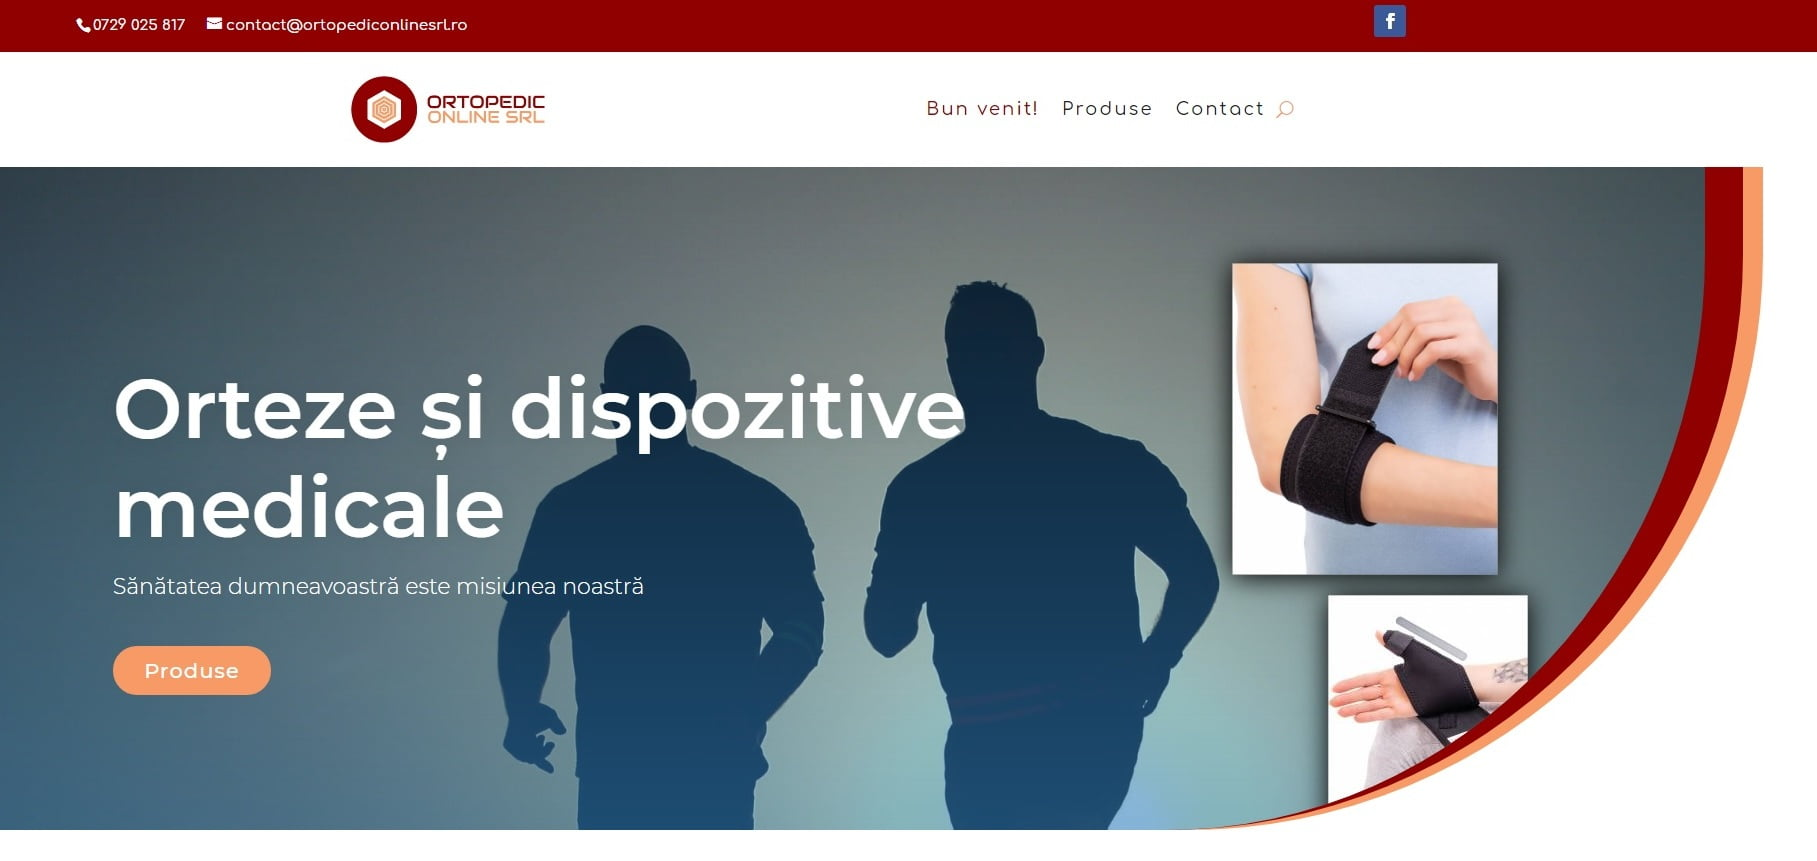 ortopediconlinesrl.ro-portofoliu-web-design-spatiuweb